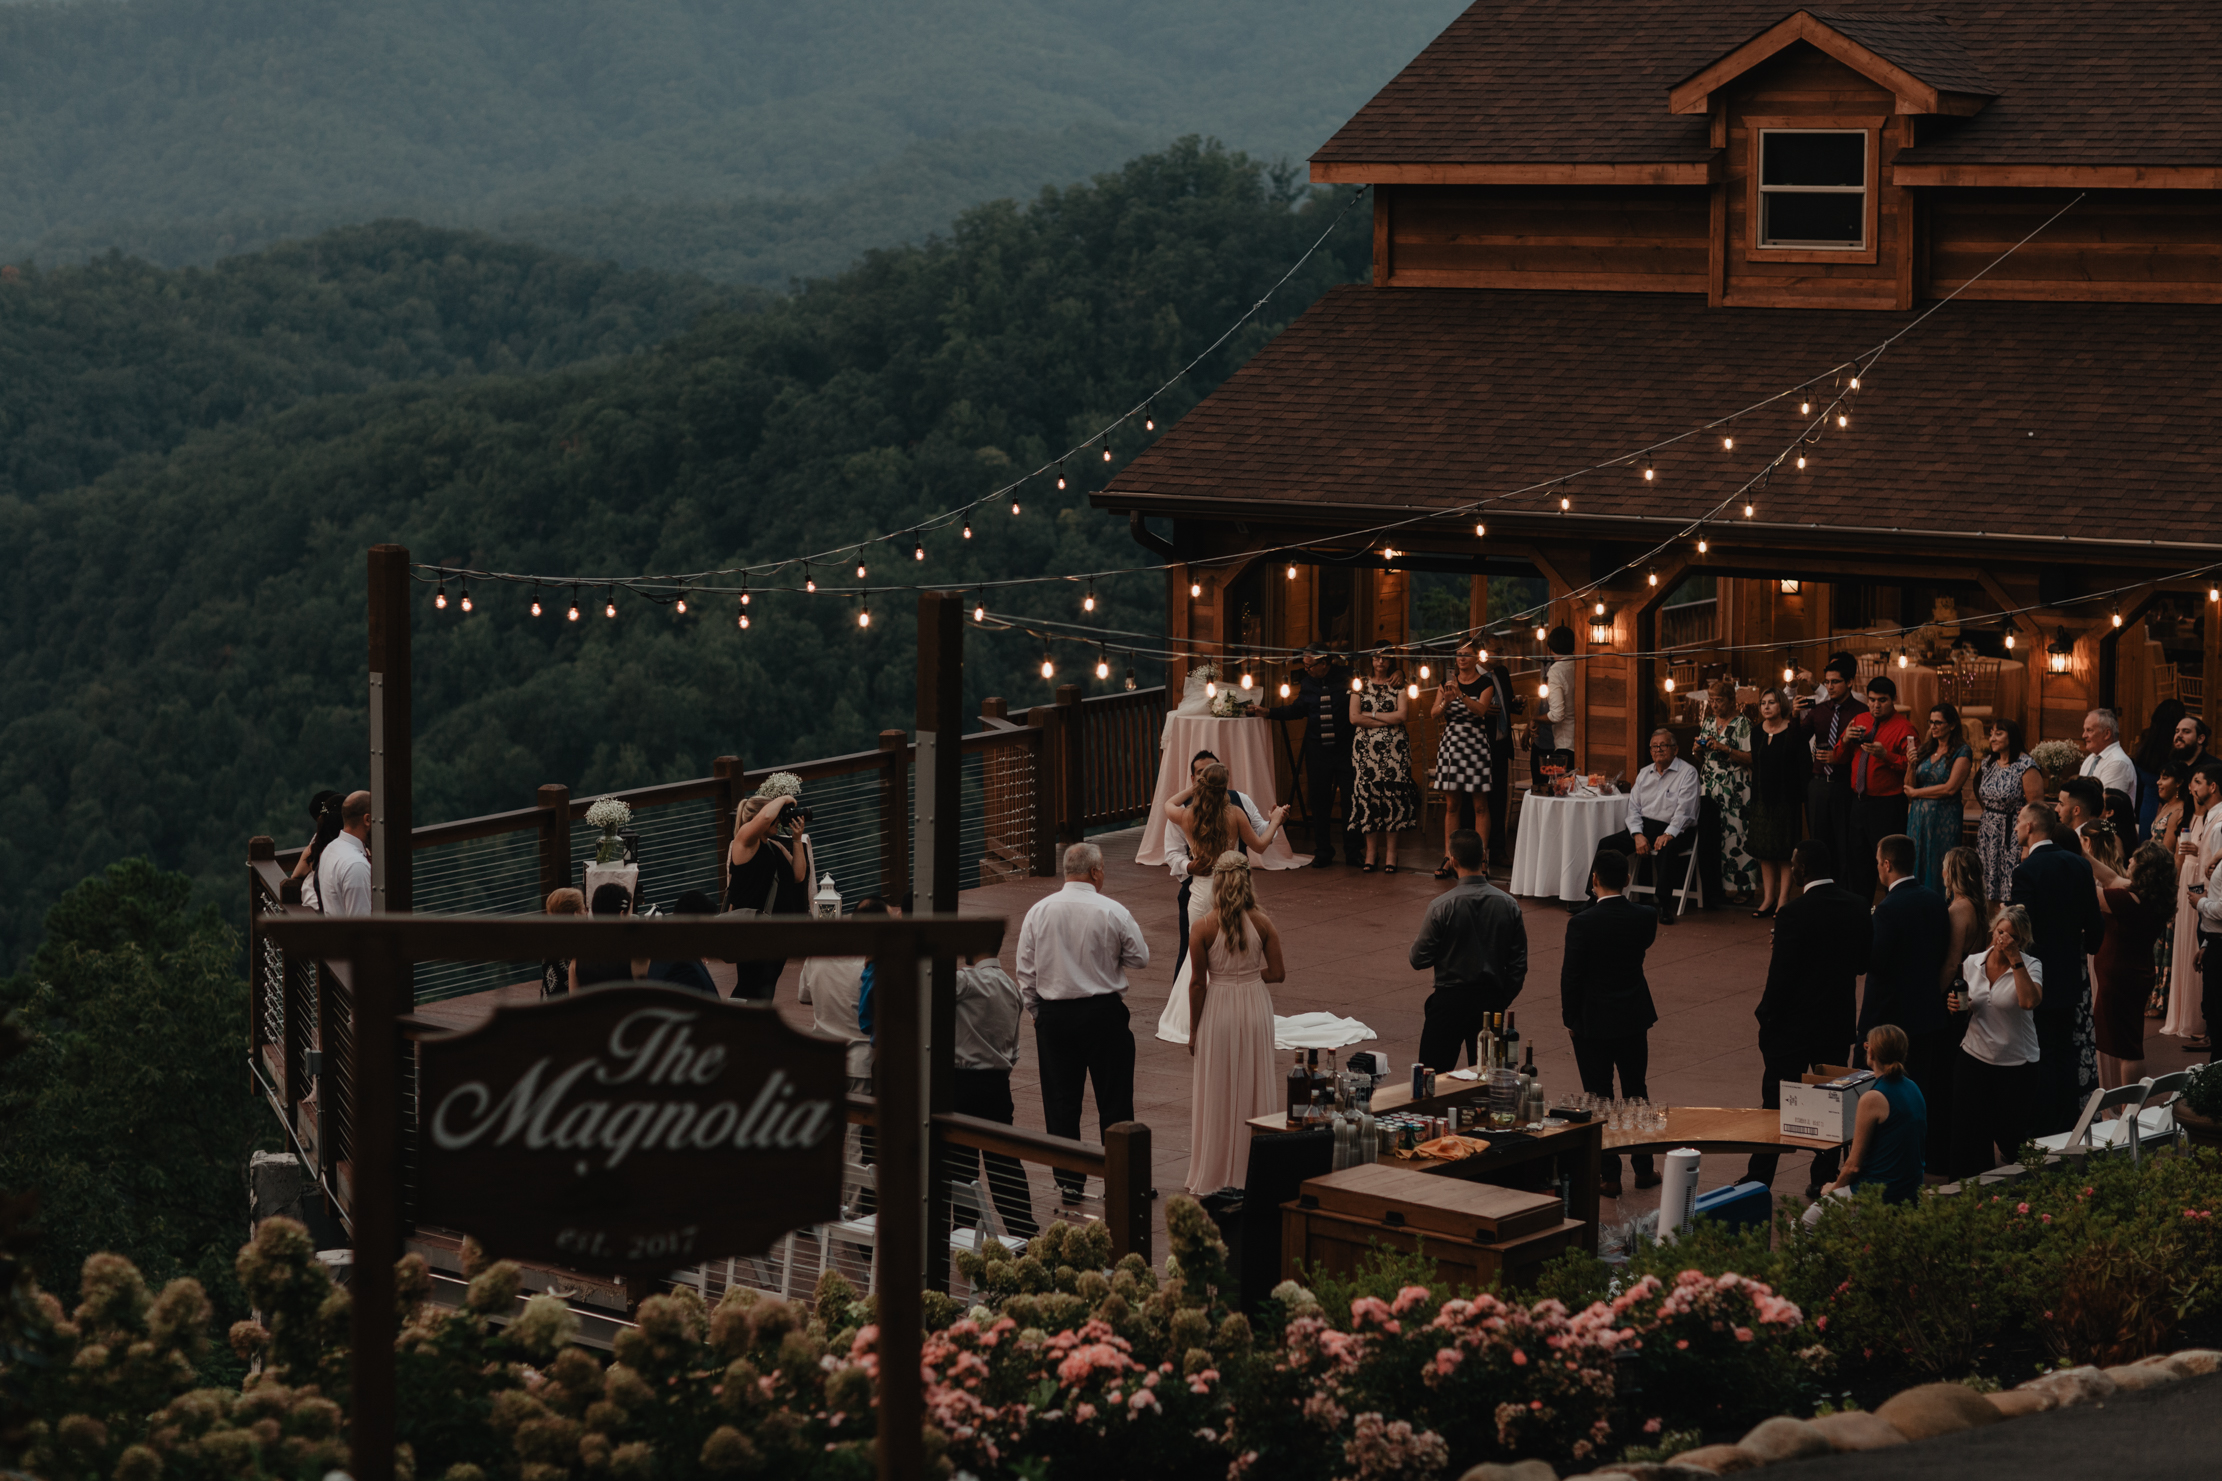 The Magnolia Venue | Smoky Mountains Wedding Photographer